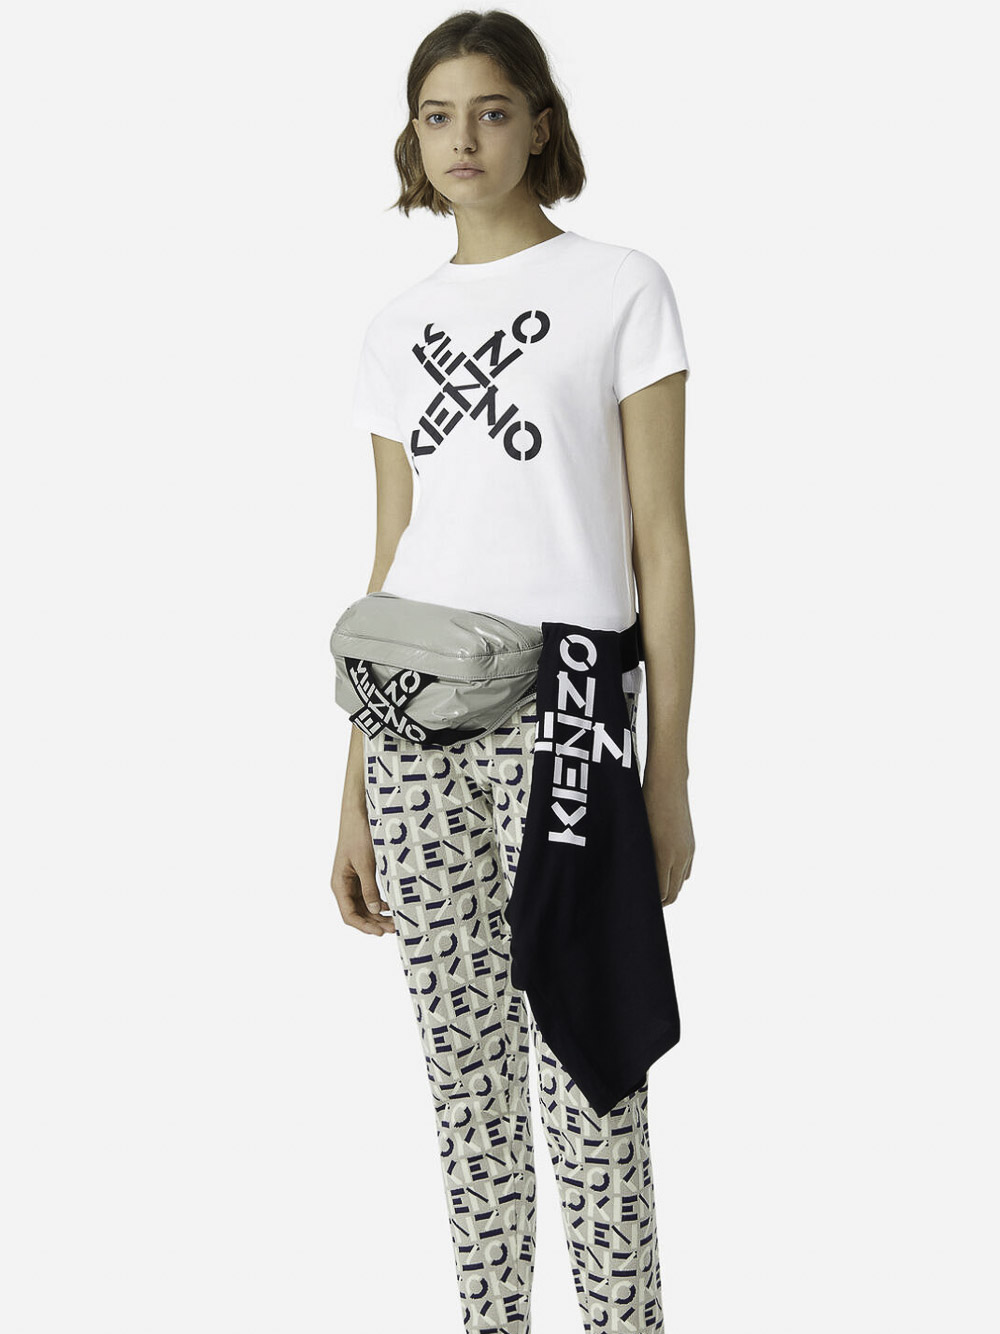 KENZO Μπλούζα t-shirt 2TS8504SJ-01 ΛΕΥΚΟ